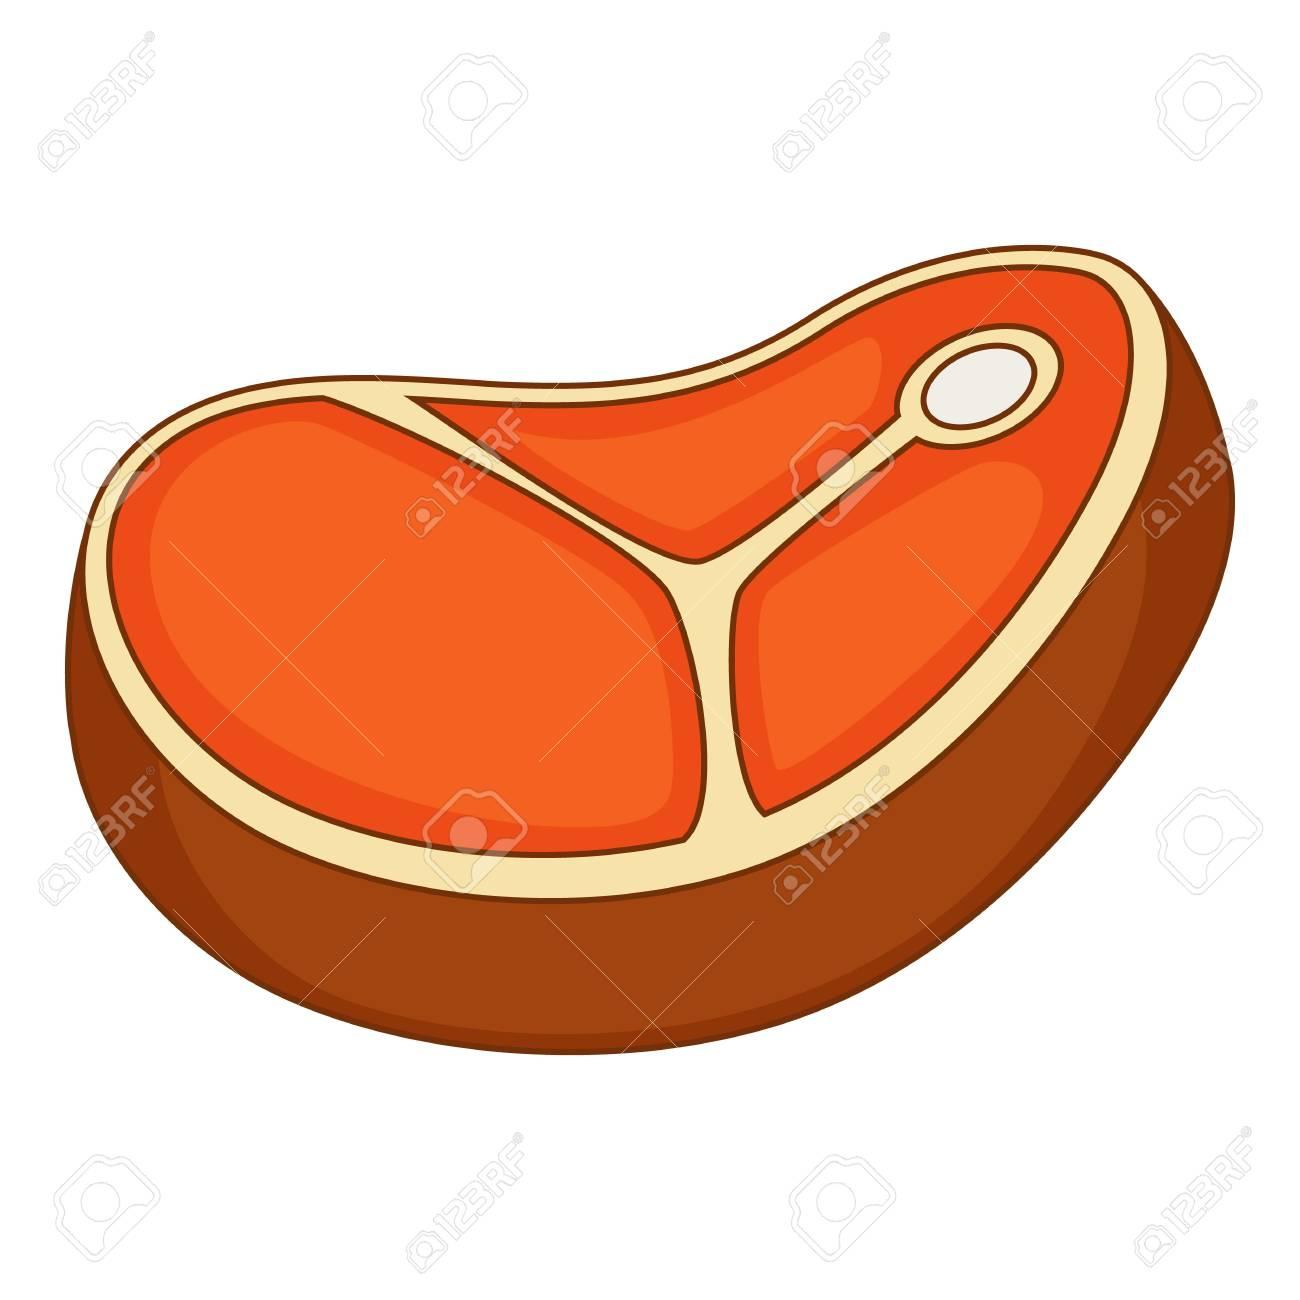 Icone De Steak De Viande Style De Dessin Anime